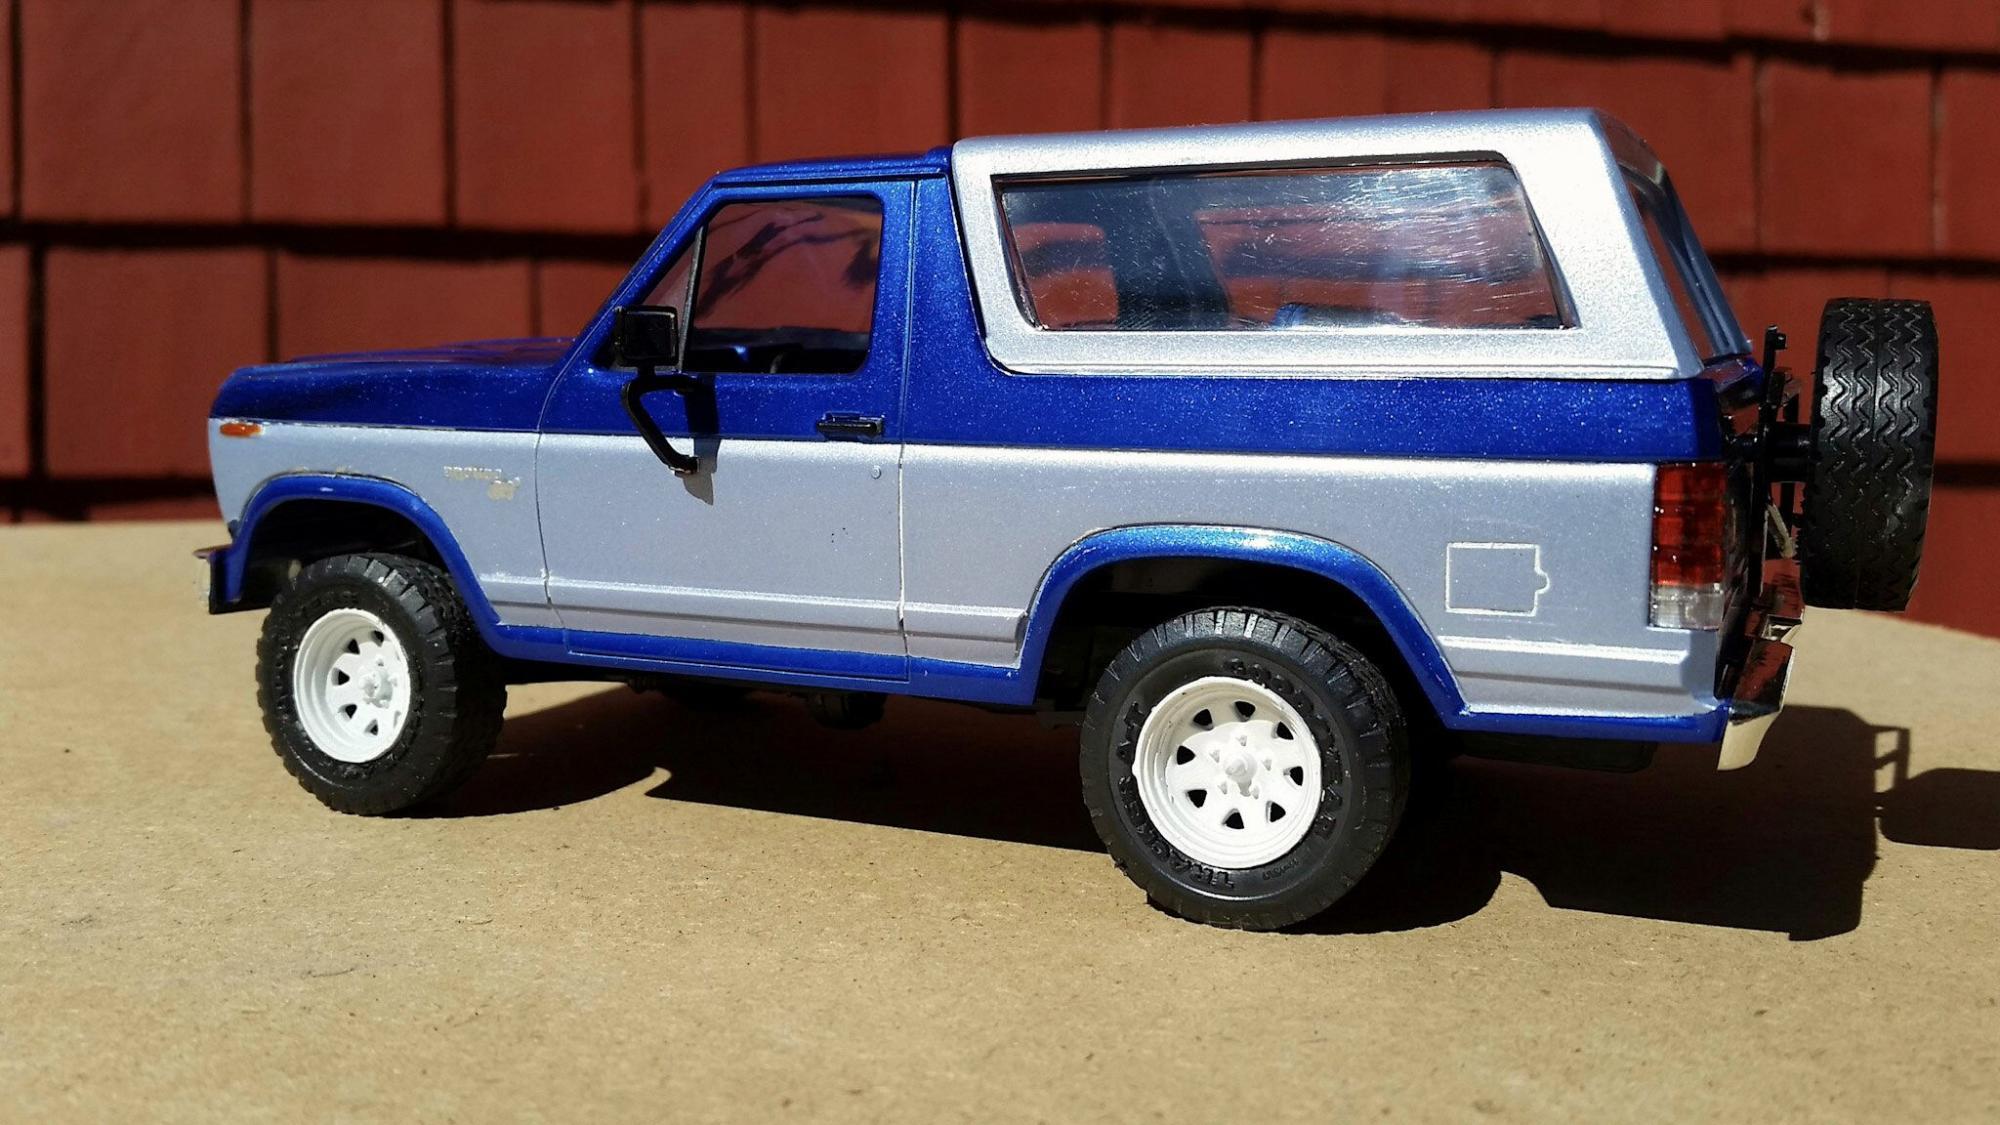 Monogram 1980 Ford Bronco Under Glass Pickups Vans Suvs Light Blue 2016 08 20 01 09 19